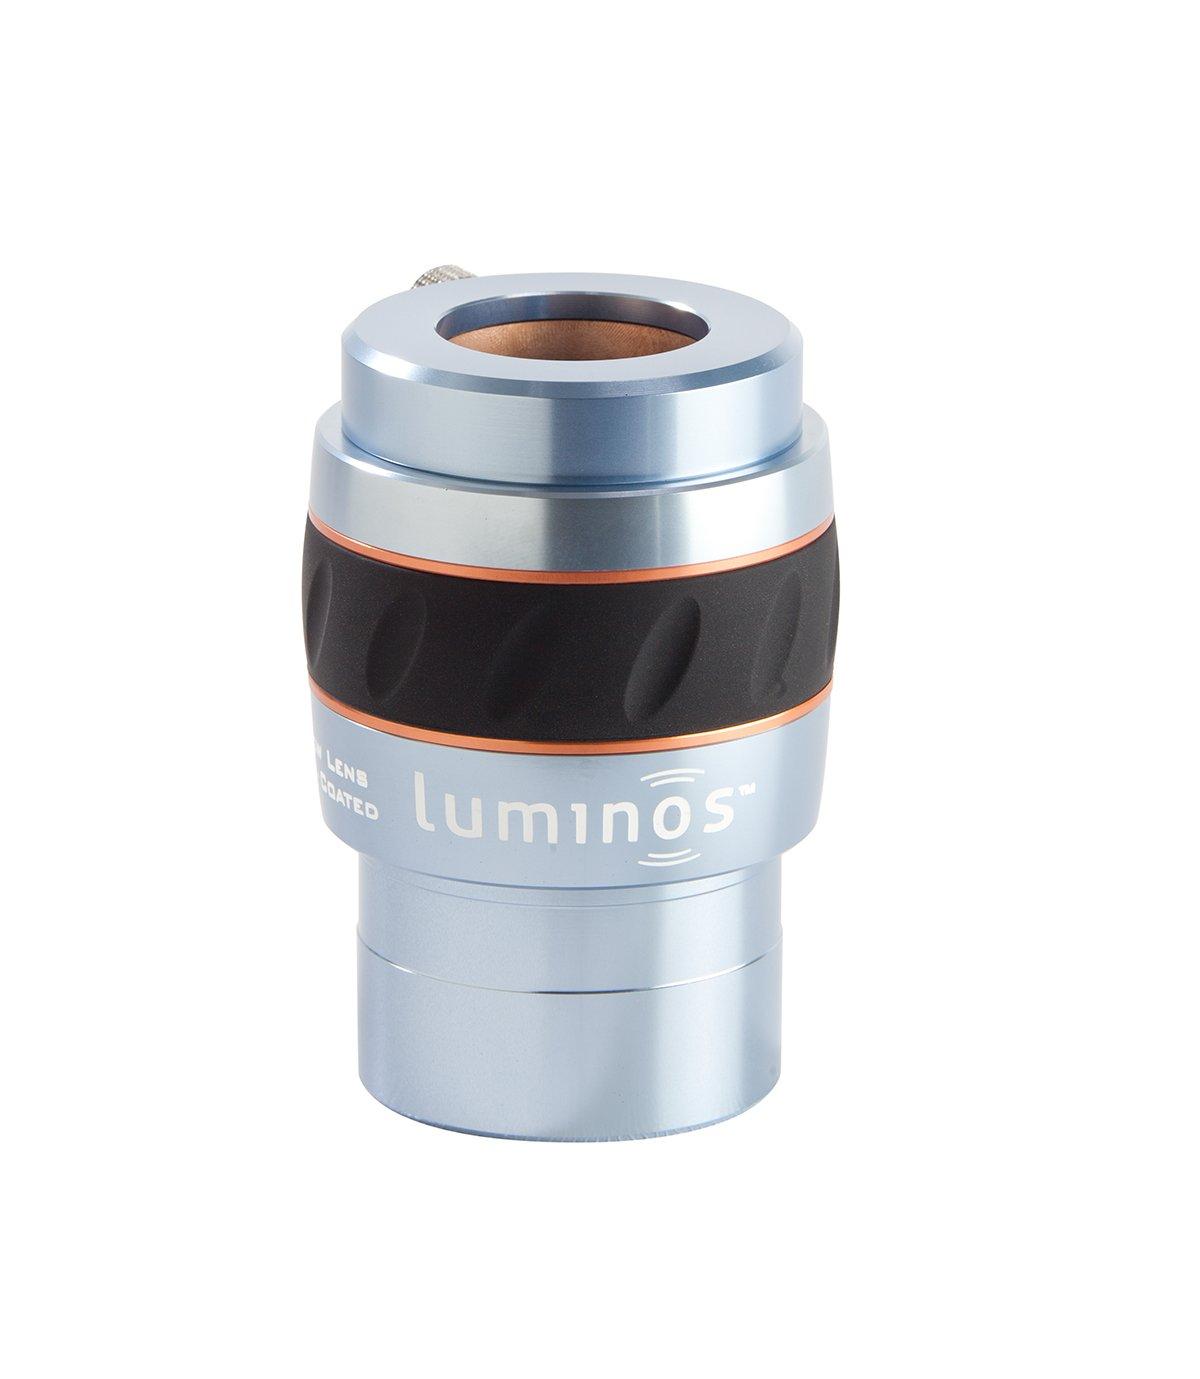 Celestron 93436 Luminous 2-Inch 2.5x Barlow Lens (Silver) by Celestron